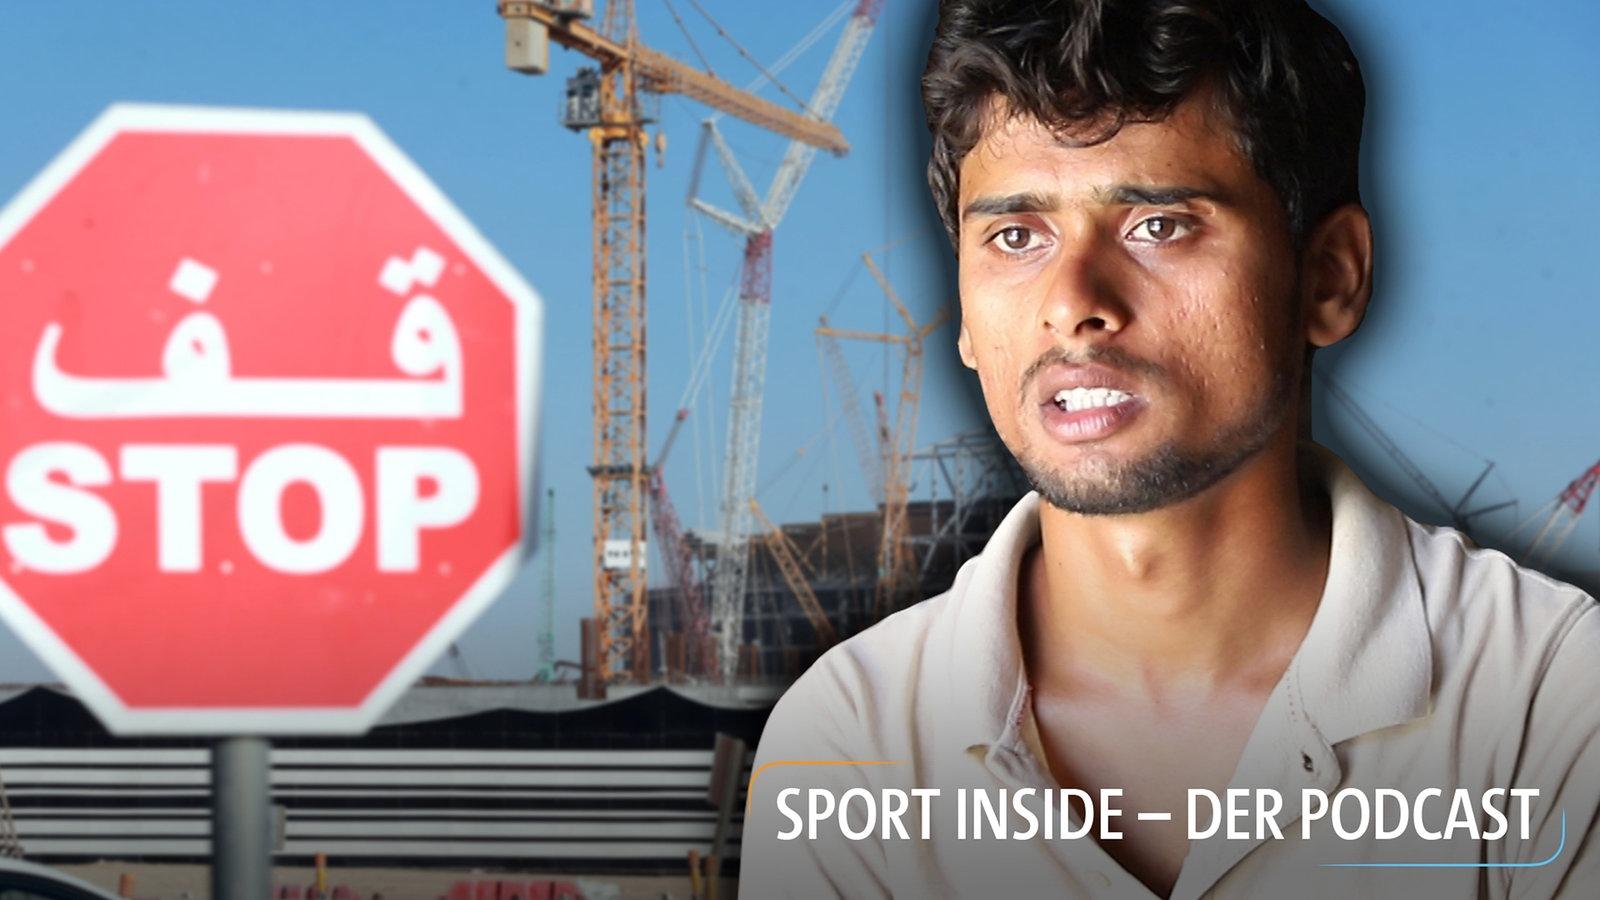 Wdr Sport Inside